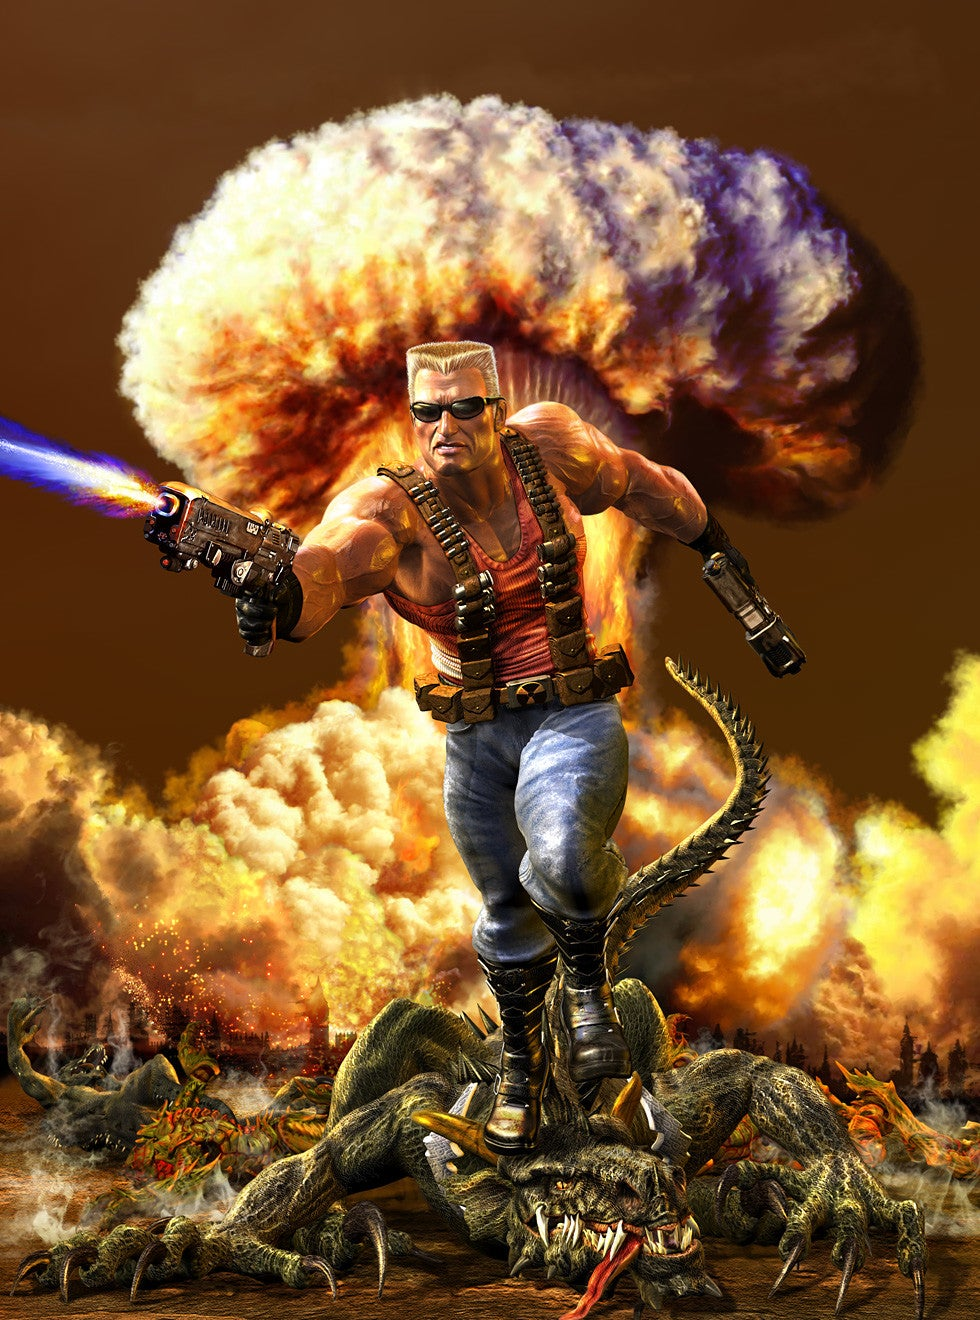 Duke Nukem, Being Duke Nukem